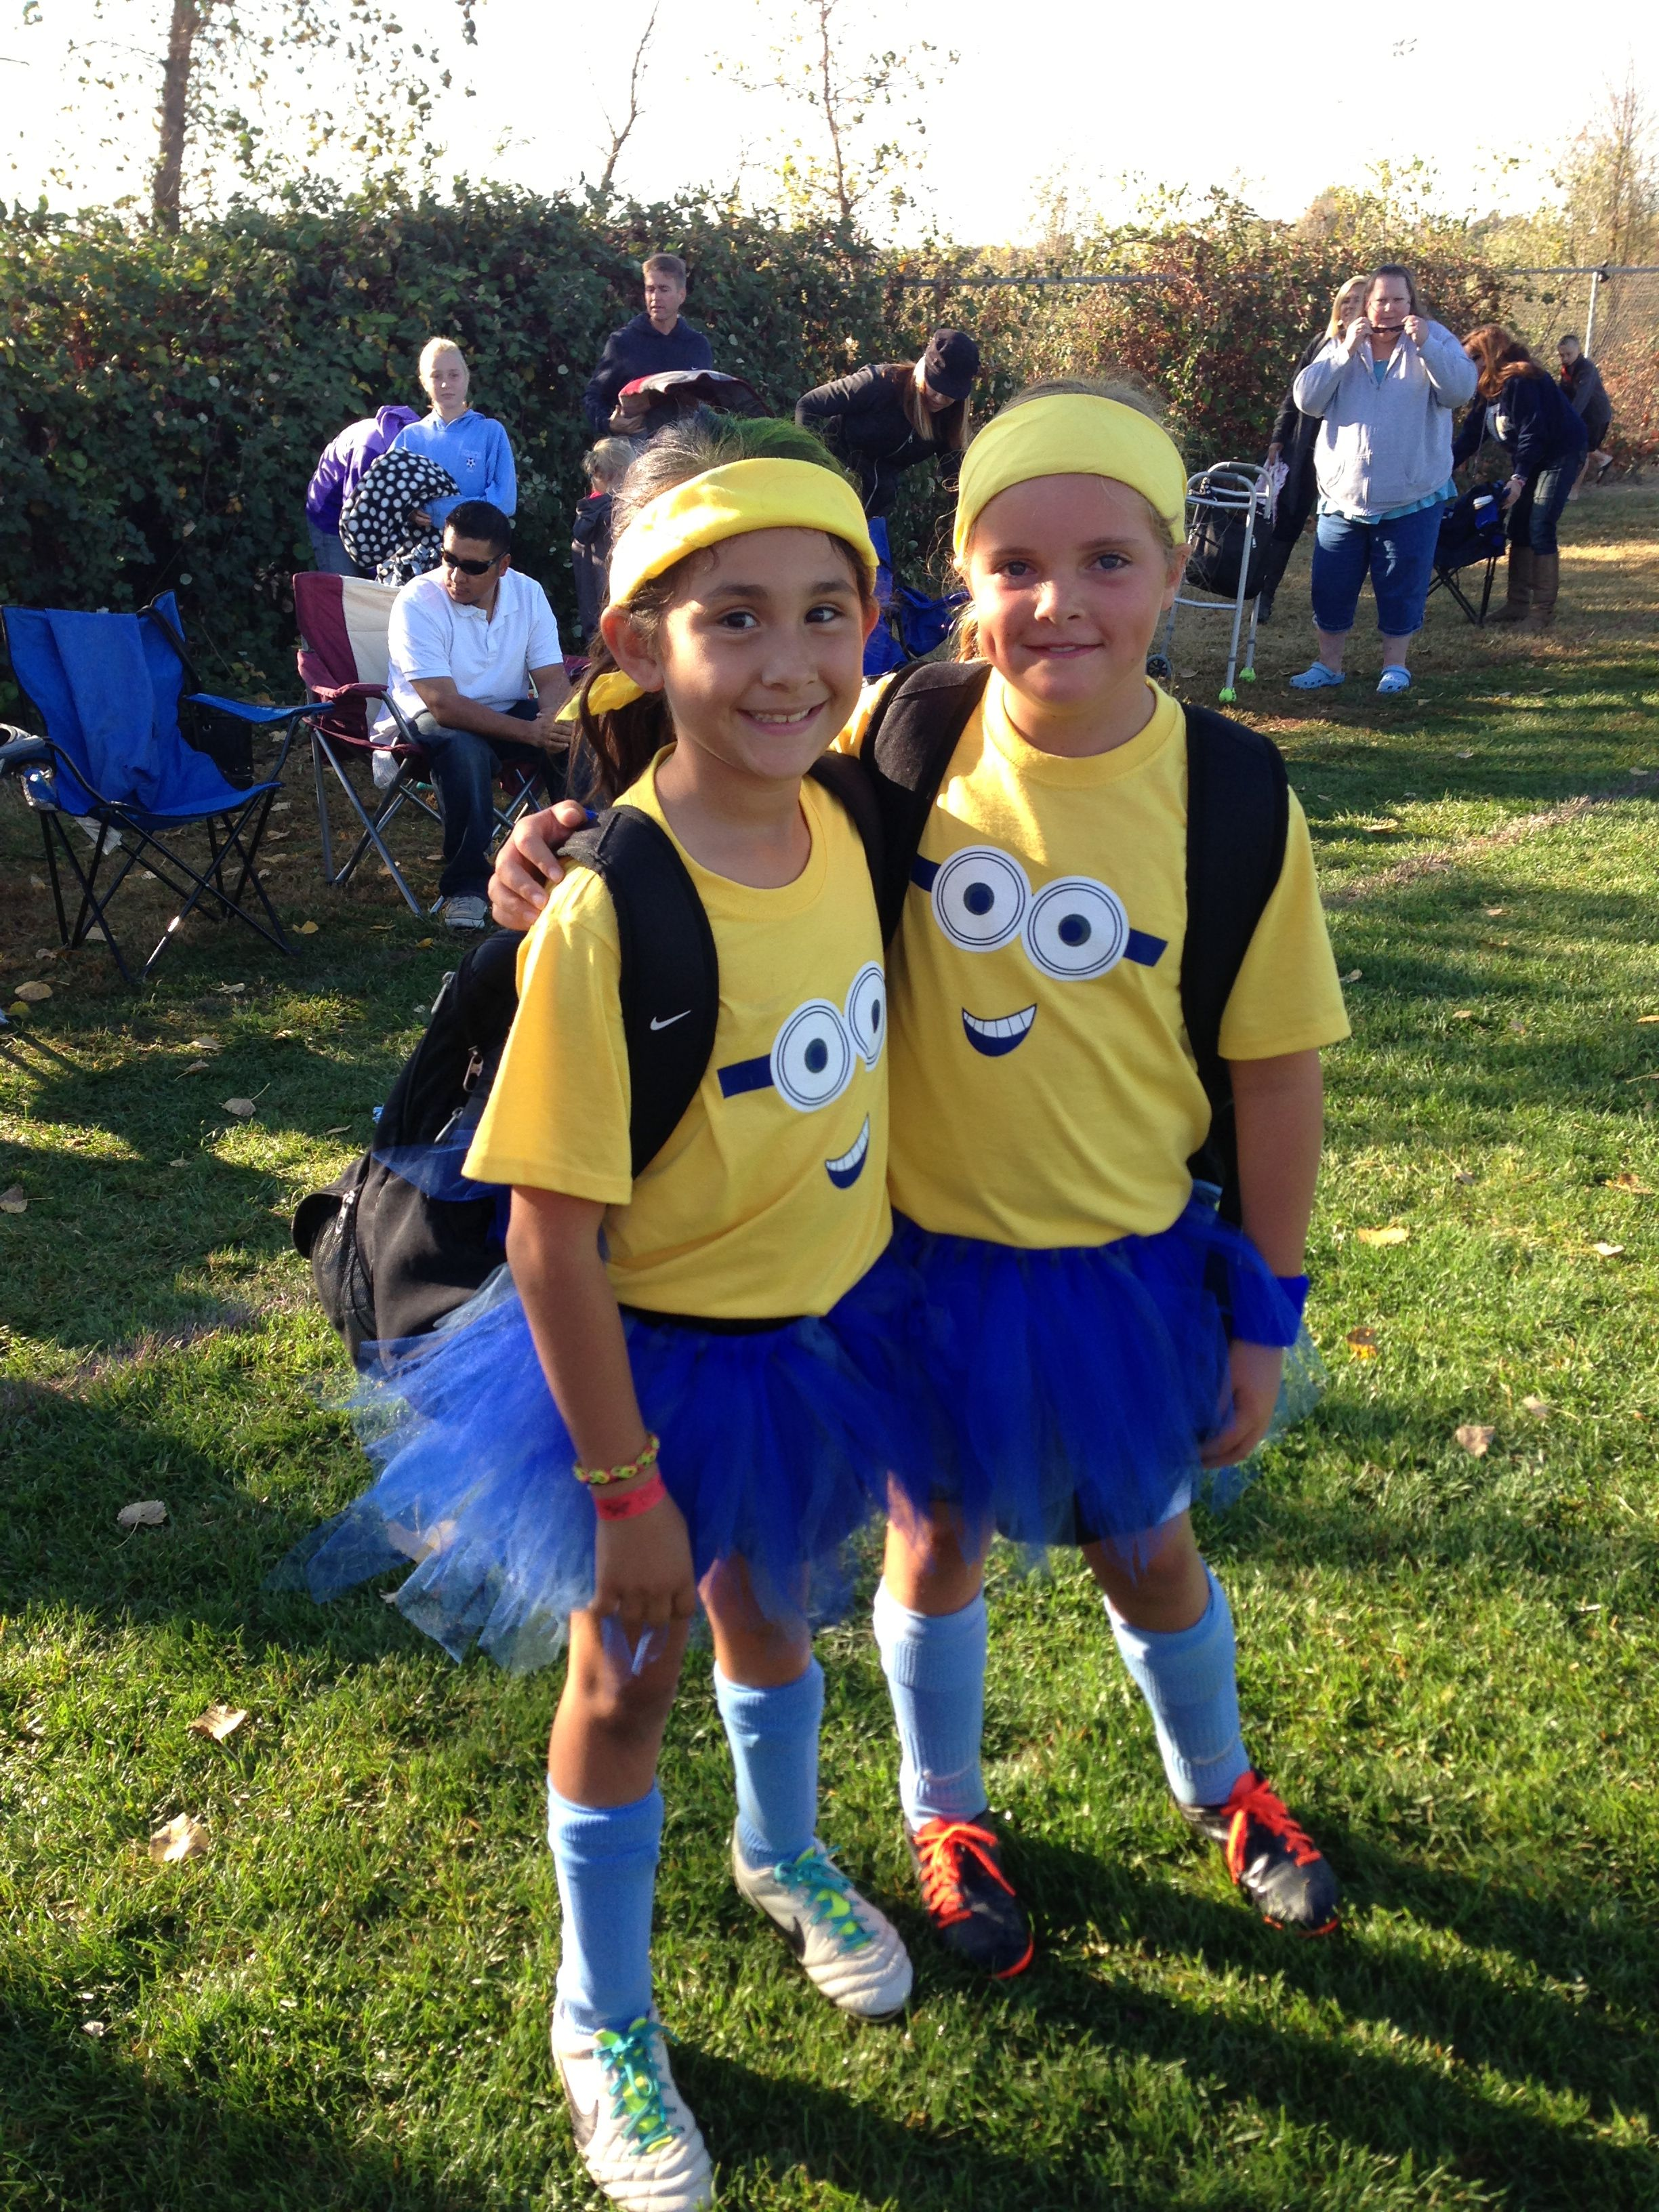 Minion Soccer Outfits Boo Fest Team Halloween